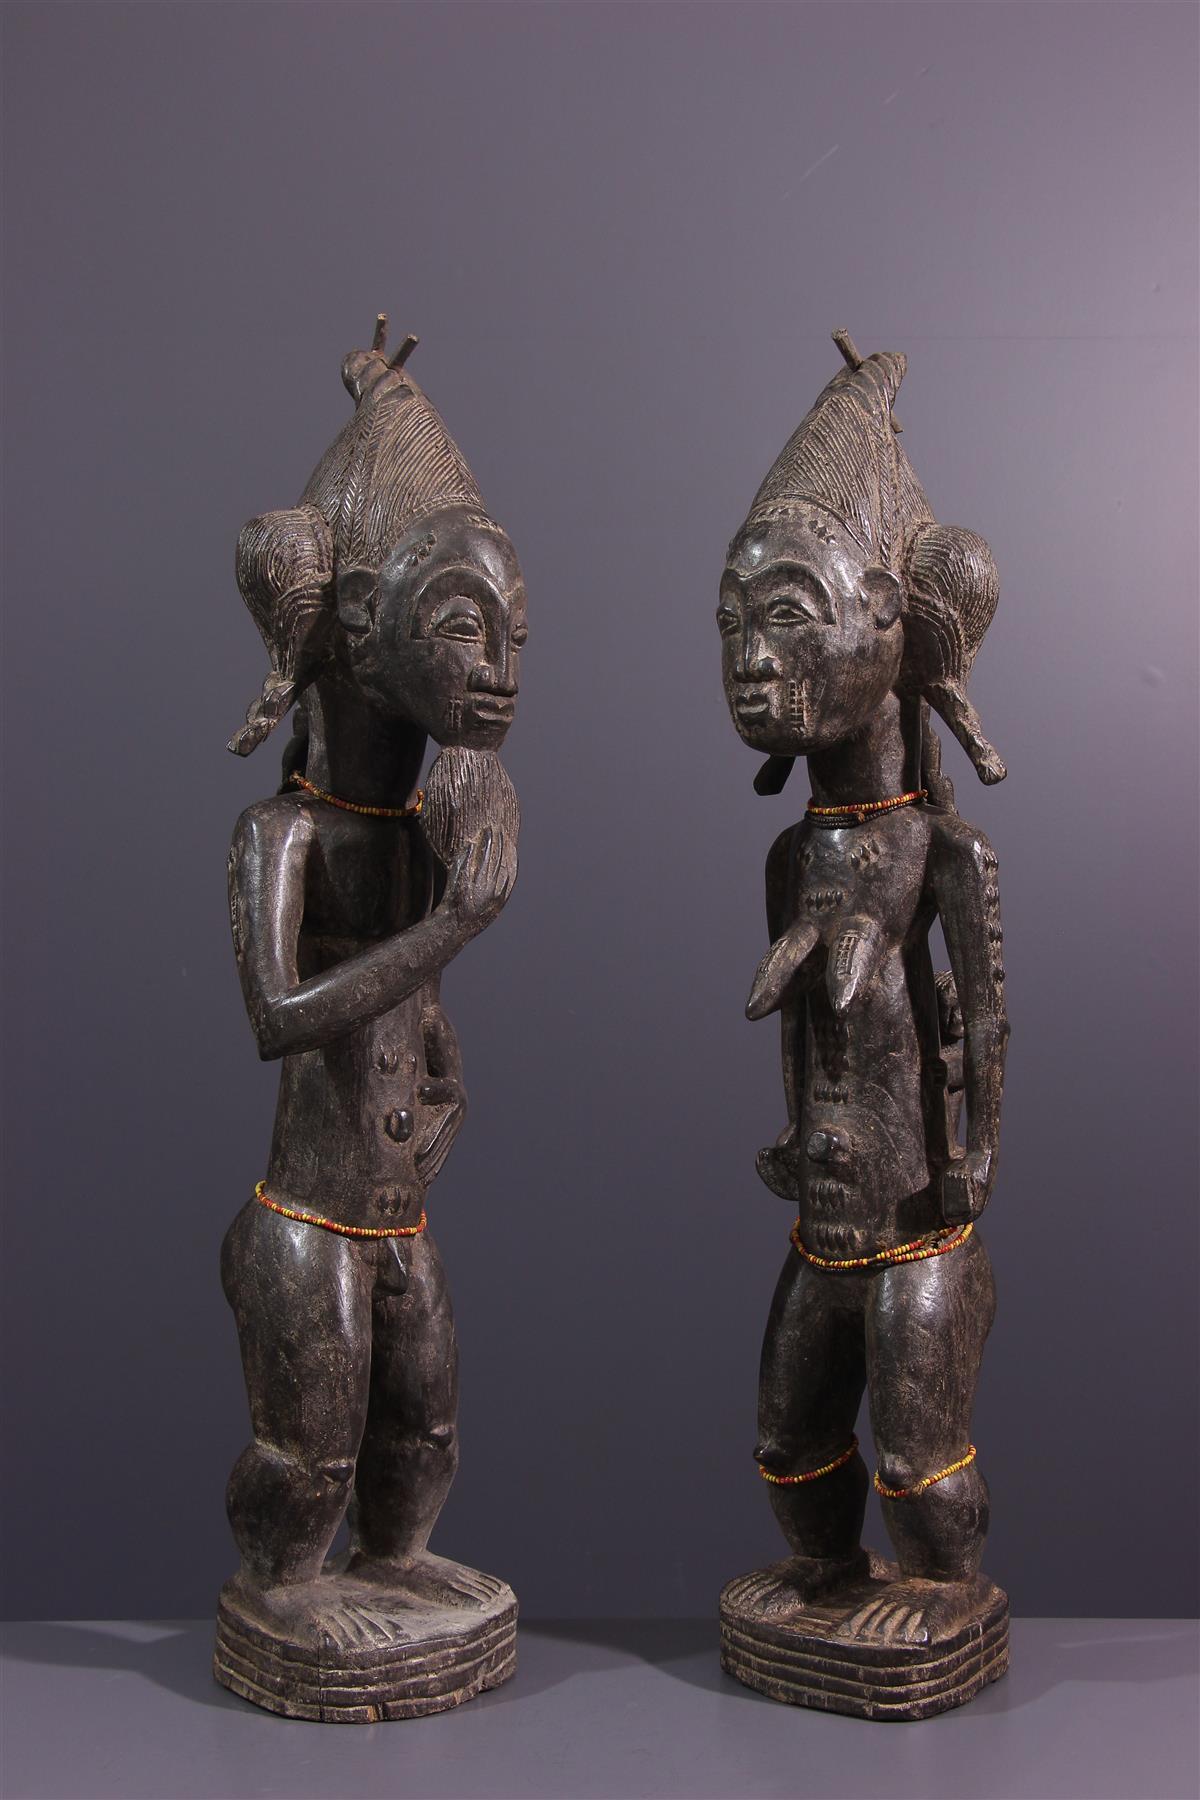 Baoule figures - African art